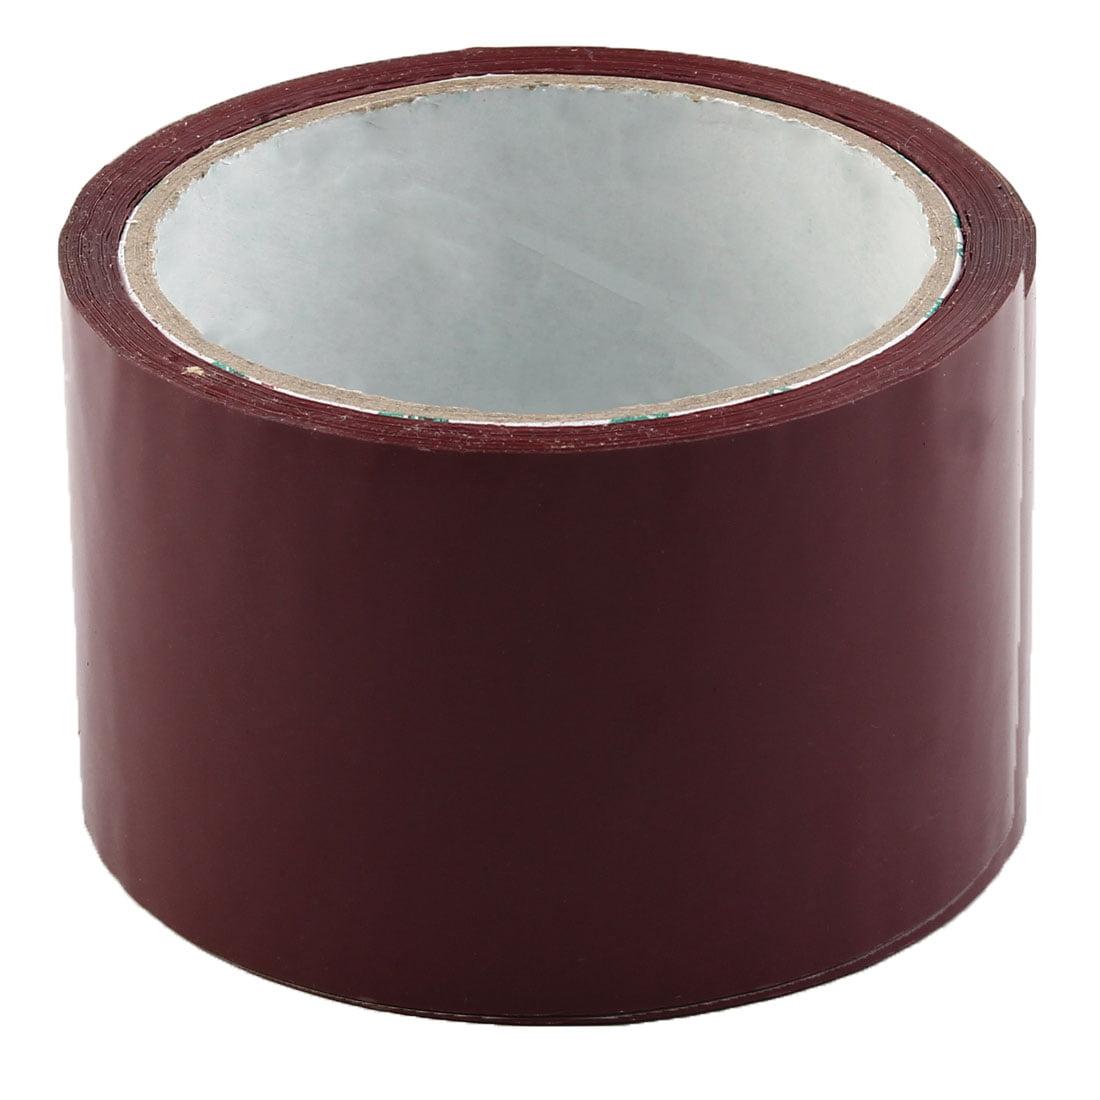 Shipping PVC Box Parcel Sealing Adhesive Tape Purple 2.4'' x 32.8 Yards(98.4 Ft)